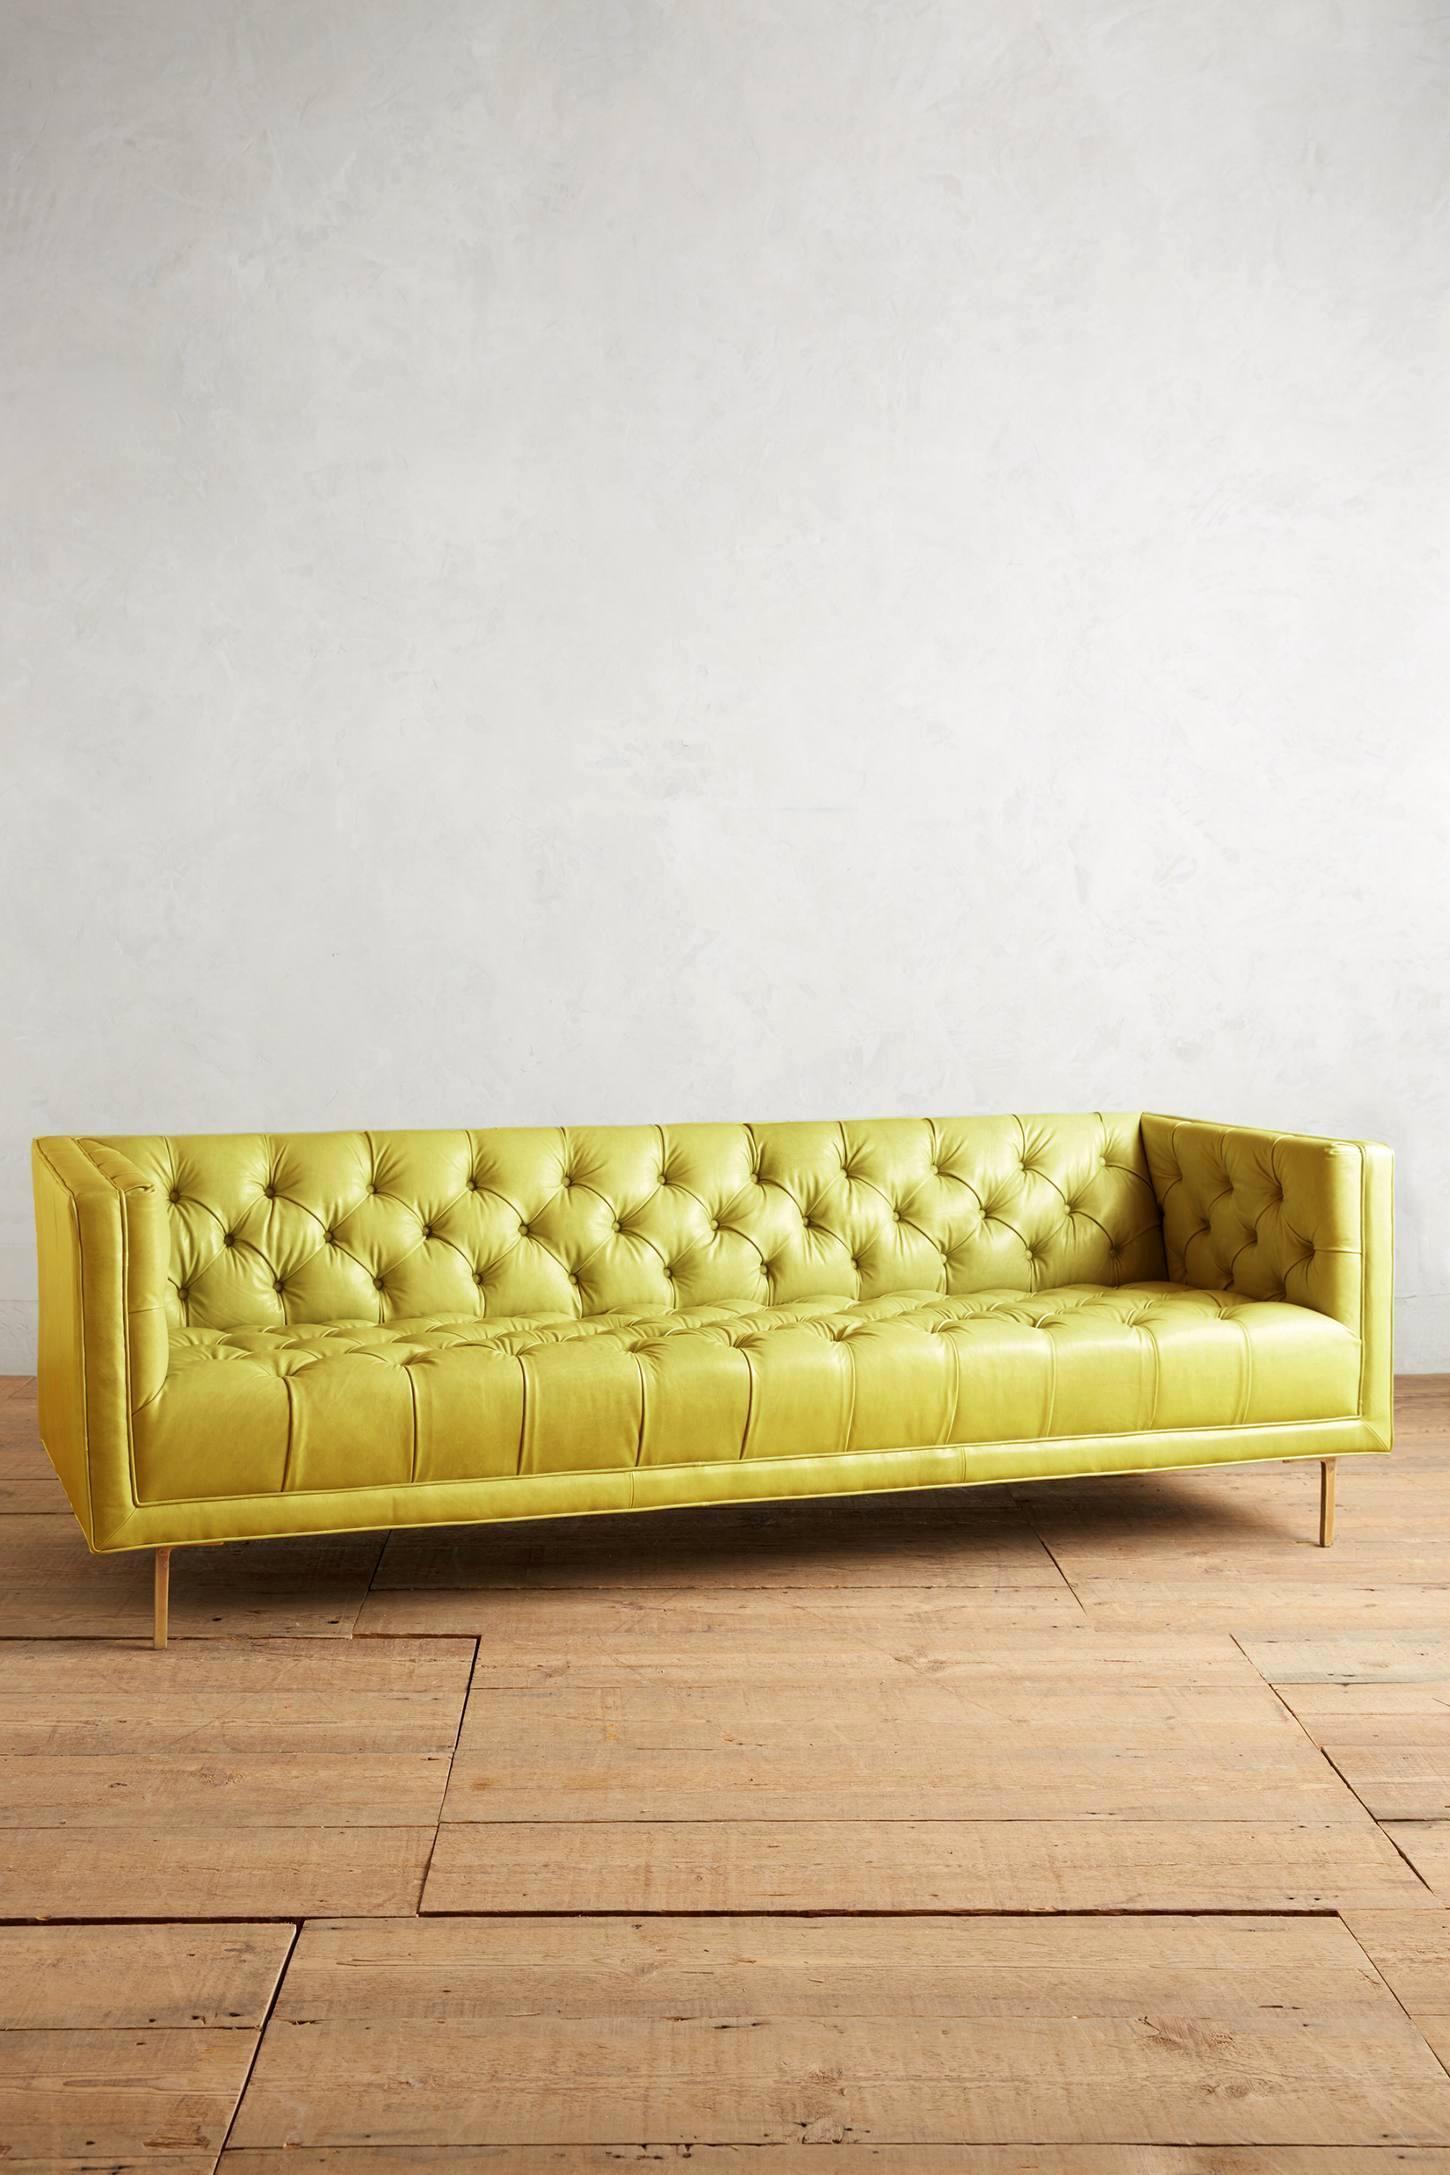 Friheten Ikea Avis Élégant Photos 50 Inspirational Friheten sofa Bed Review 50 S